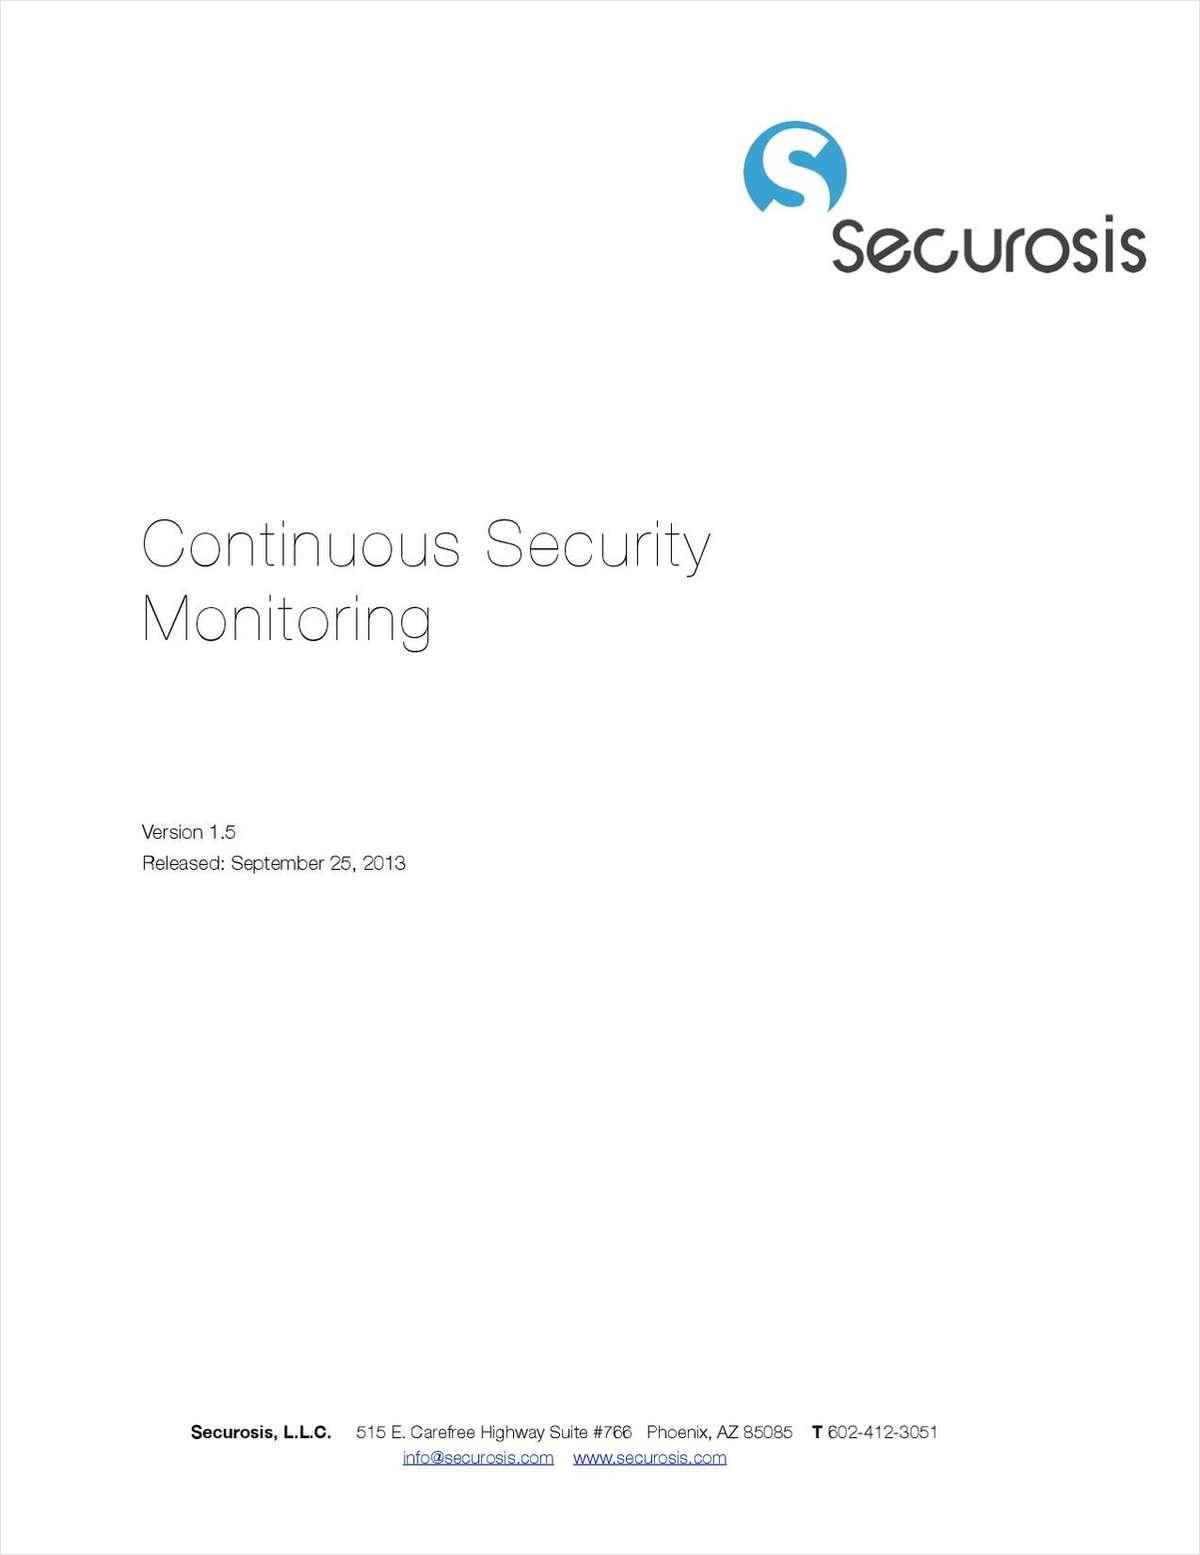 Continuous Security Monitoring (CSM)